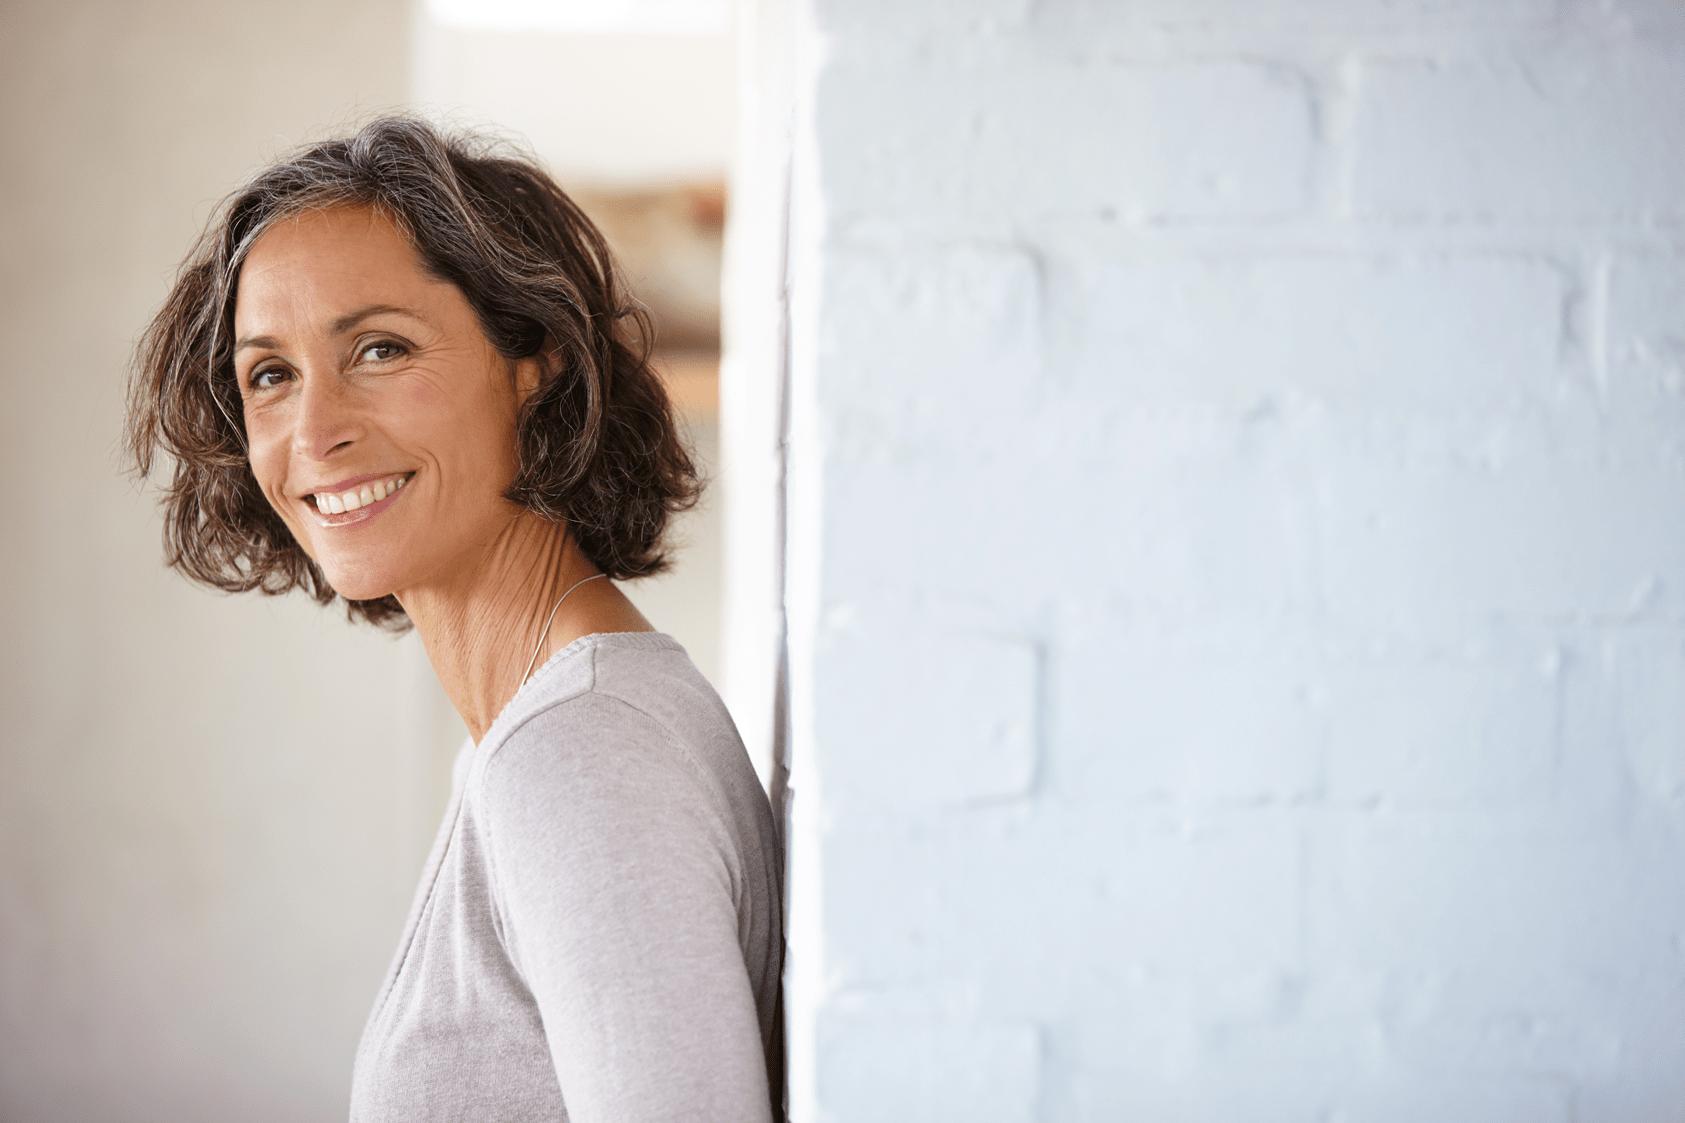 Wechseljahre Verstopfung Frau mittleren Alters an Wand gelehnt